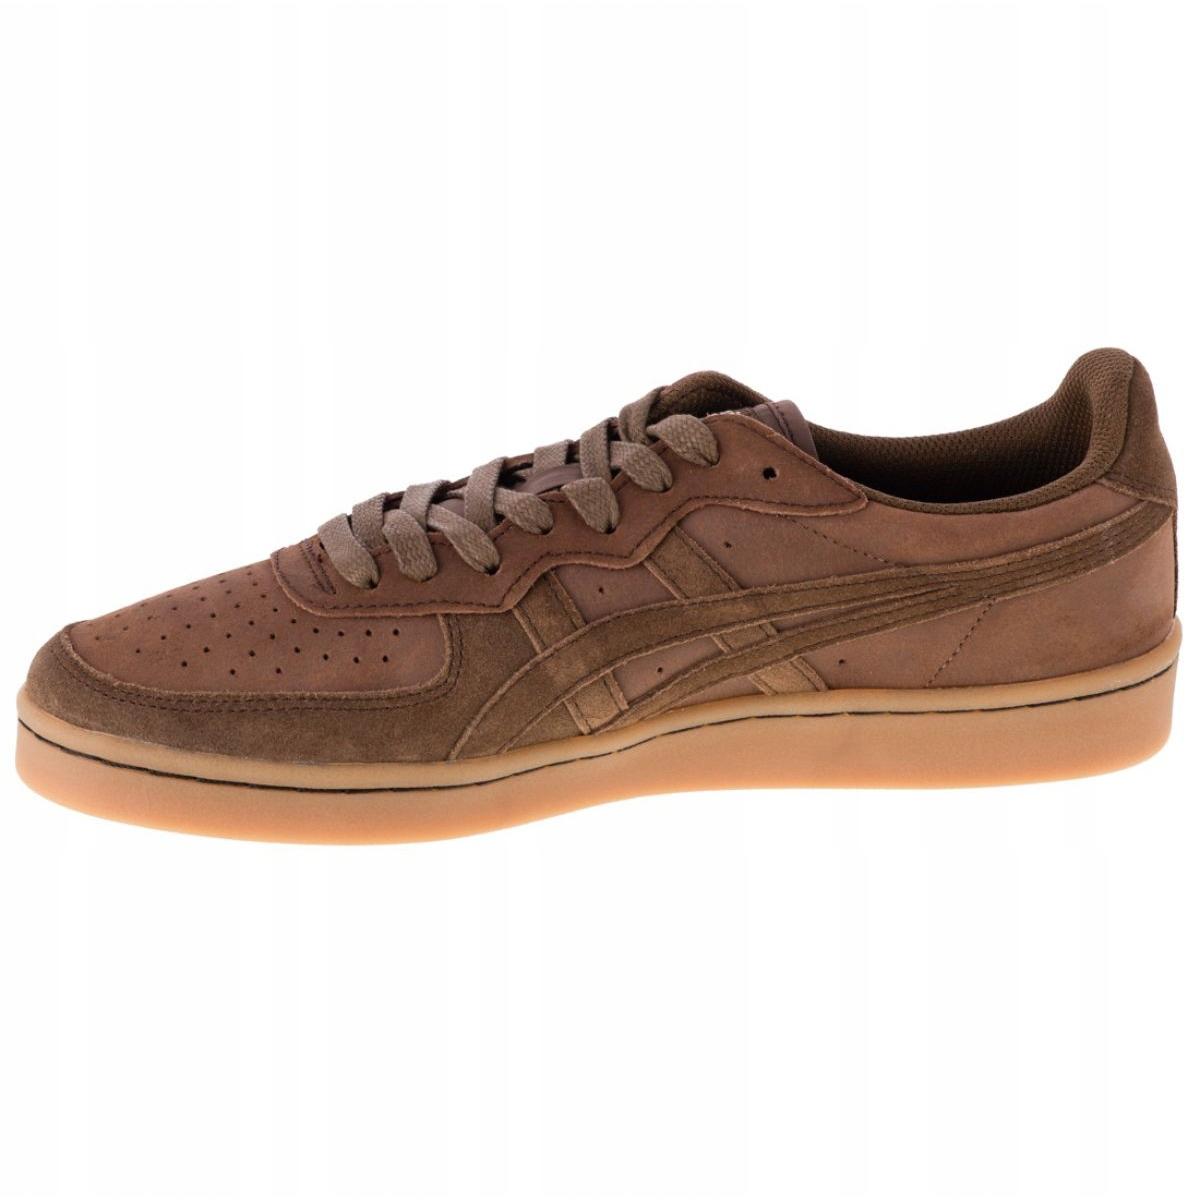 Asics Onitsuka Tiger Gsm M 1183A842-200 shoes brown